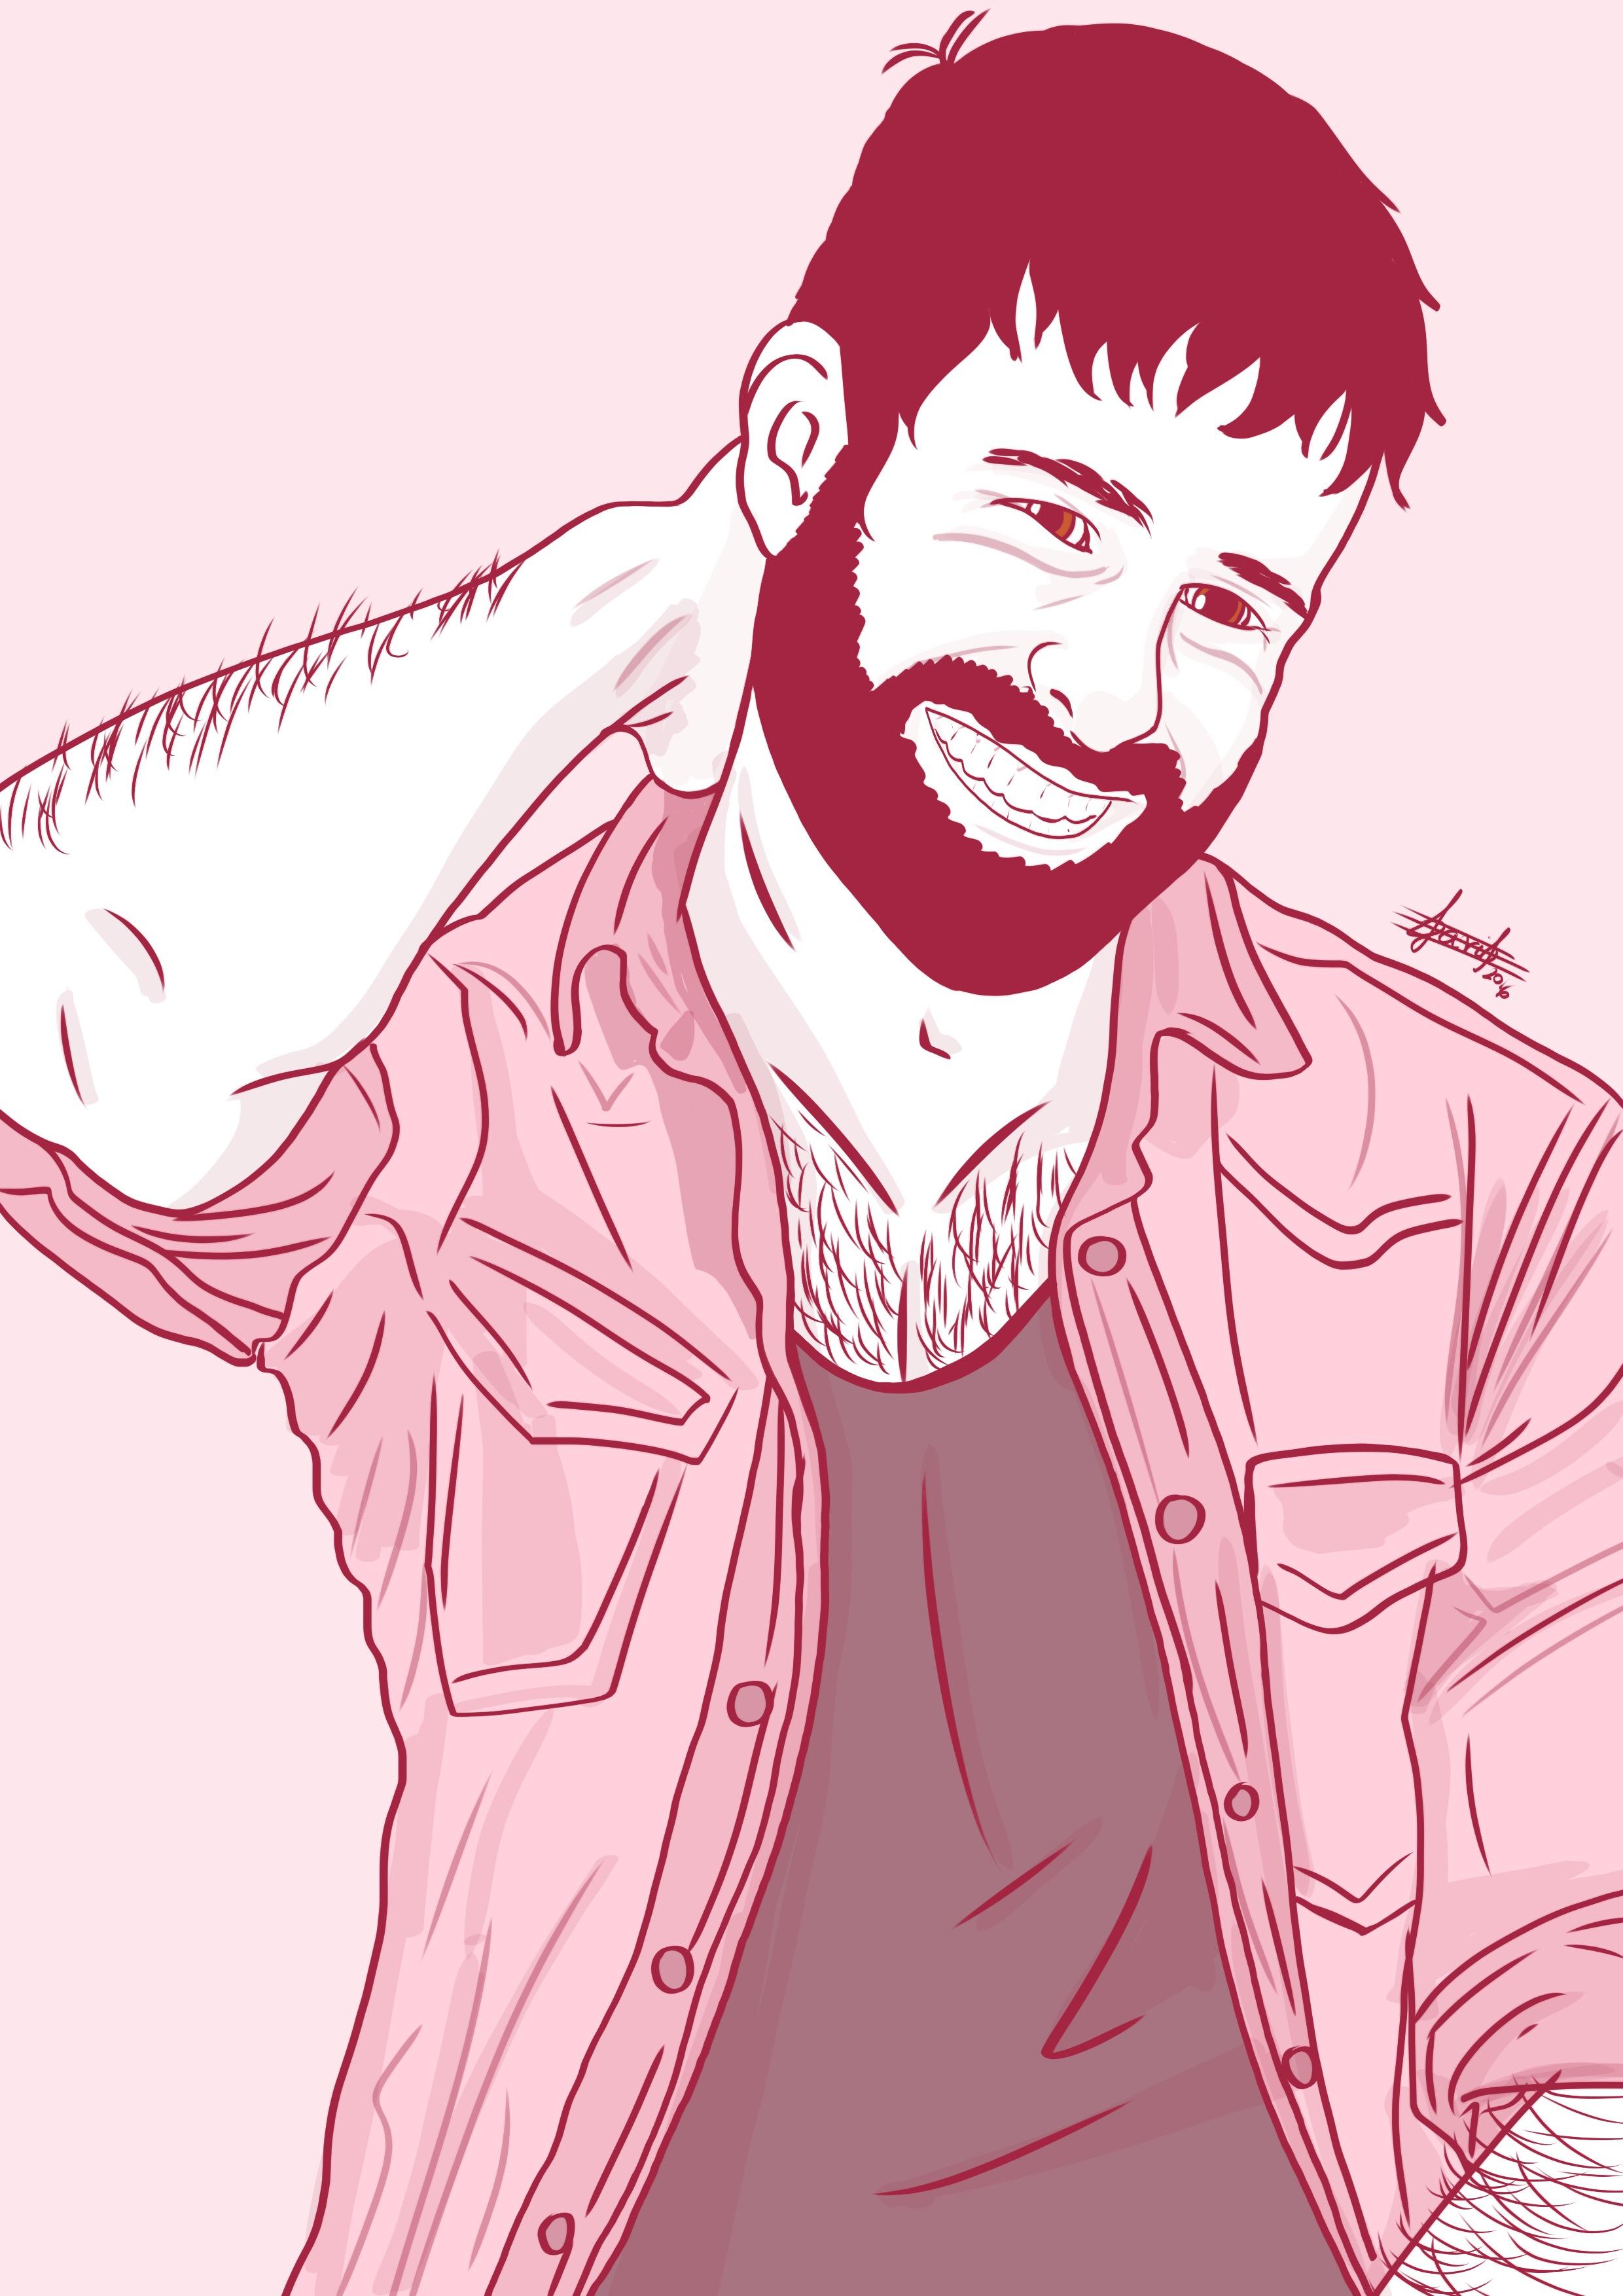 Pink_Smile_David_Pallás_Gozalo